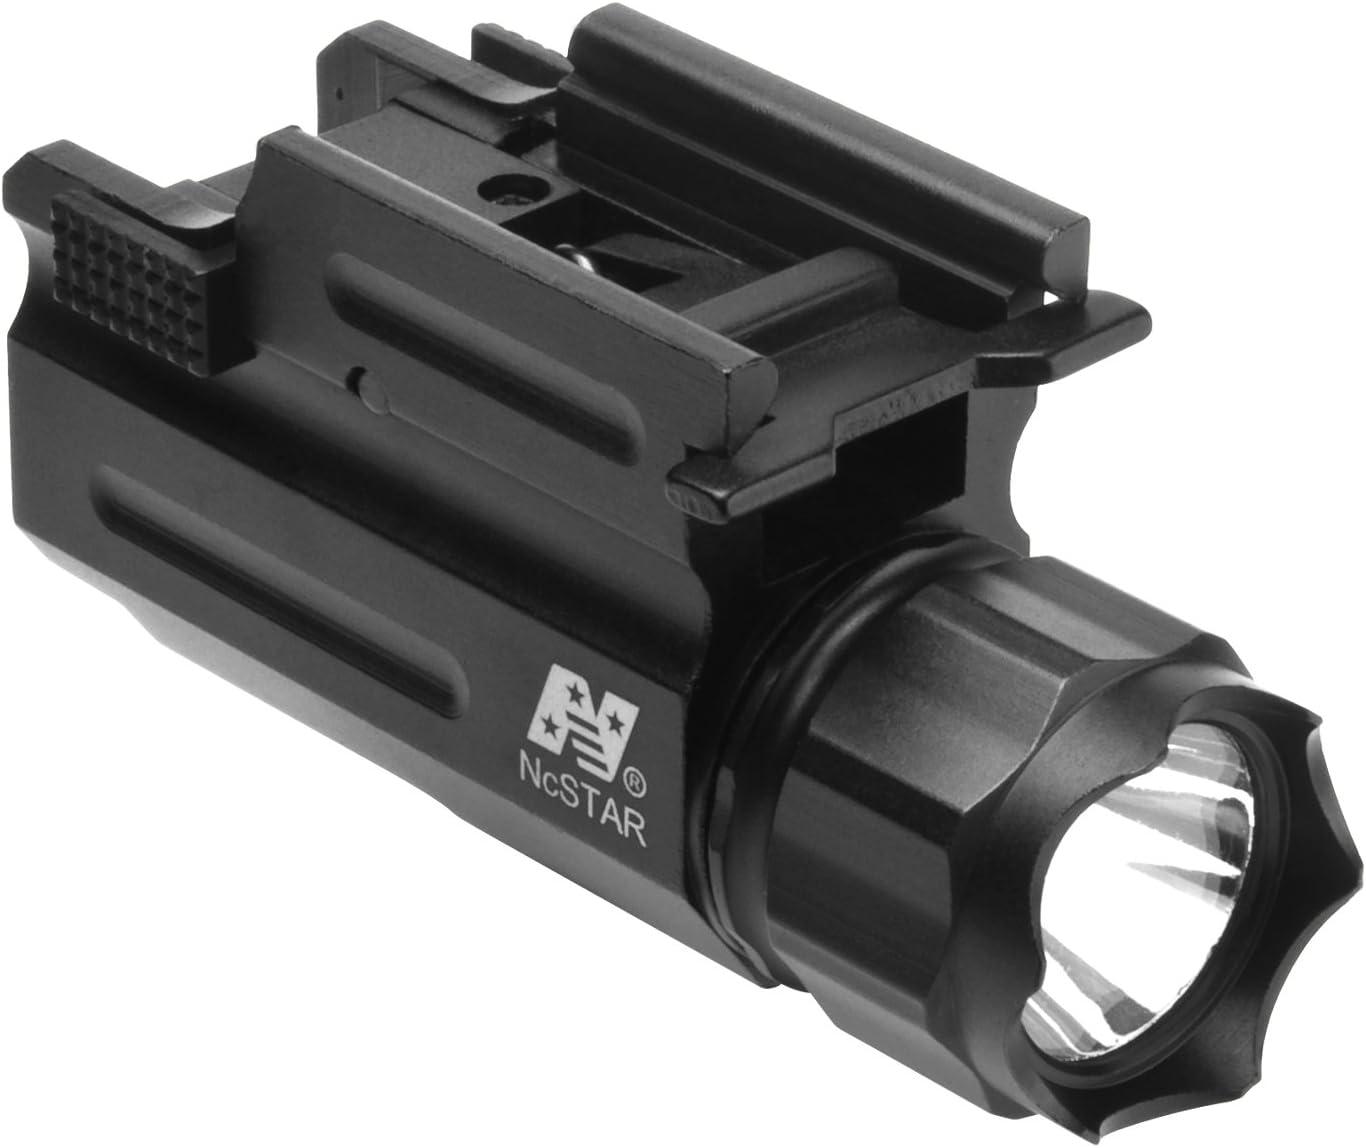 NcSTAR Weaver Mount Tactical LED Light Flashlight